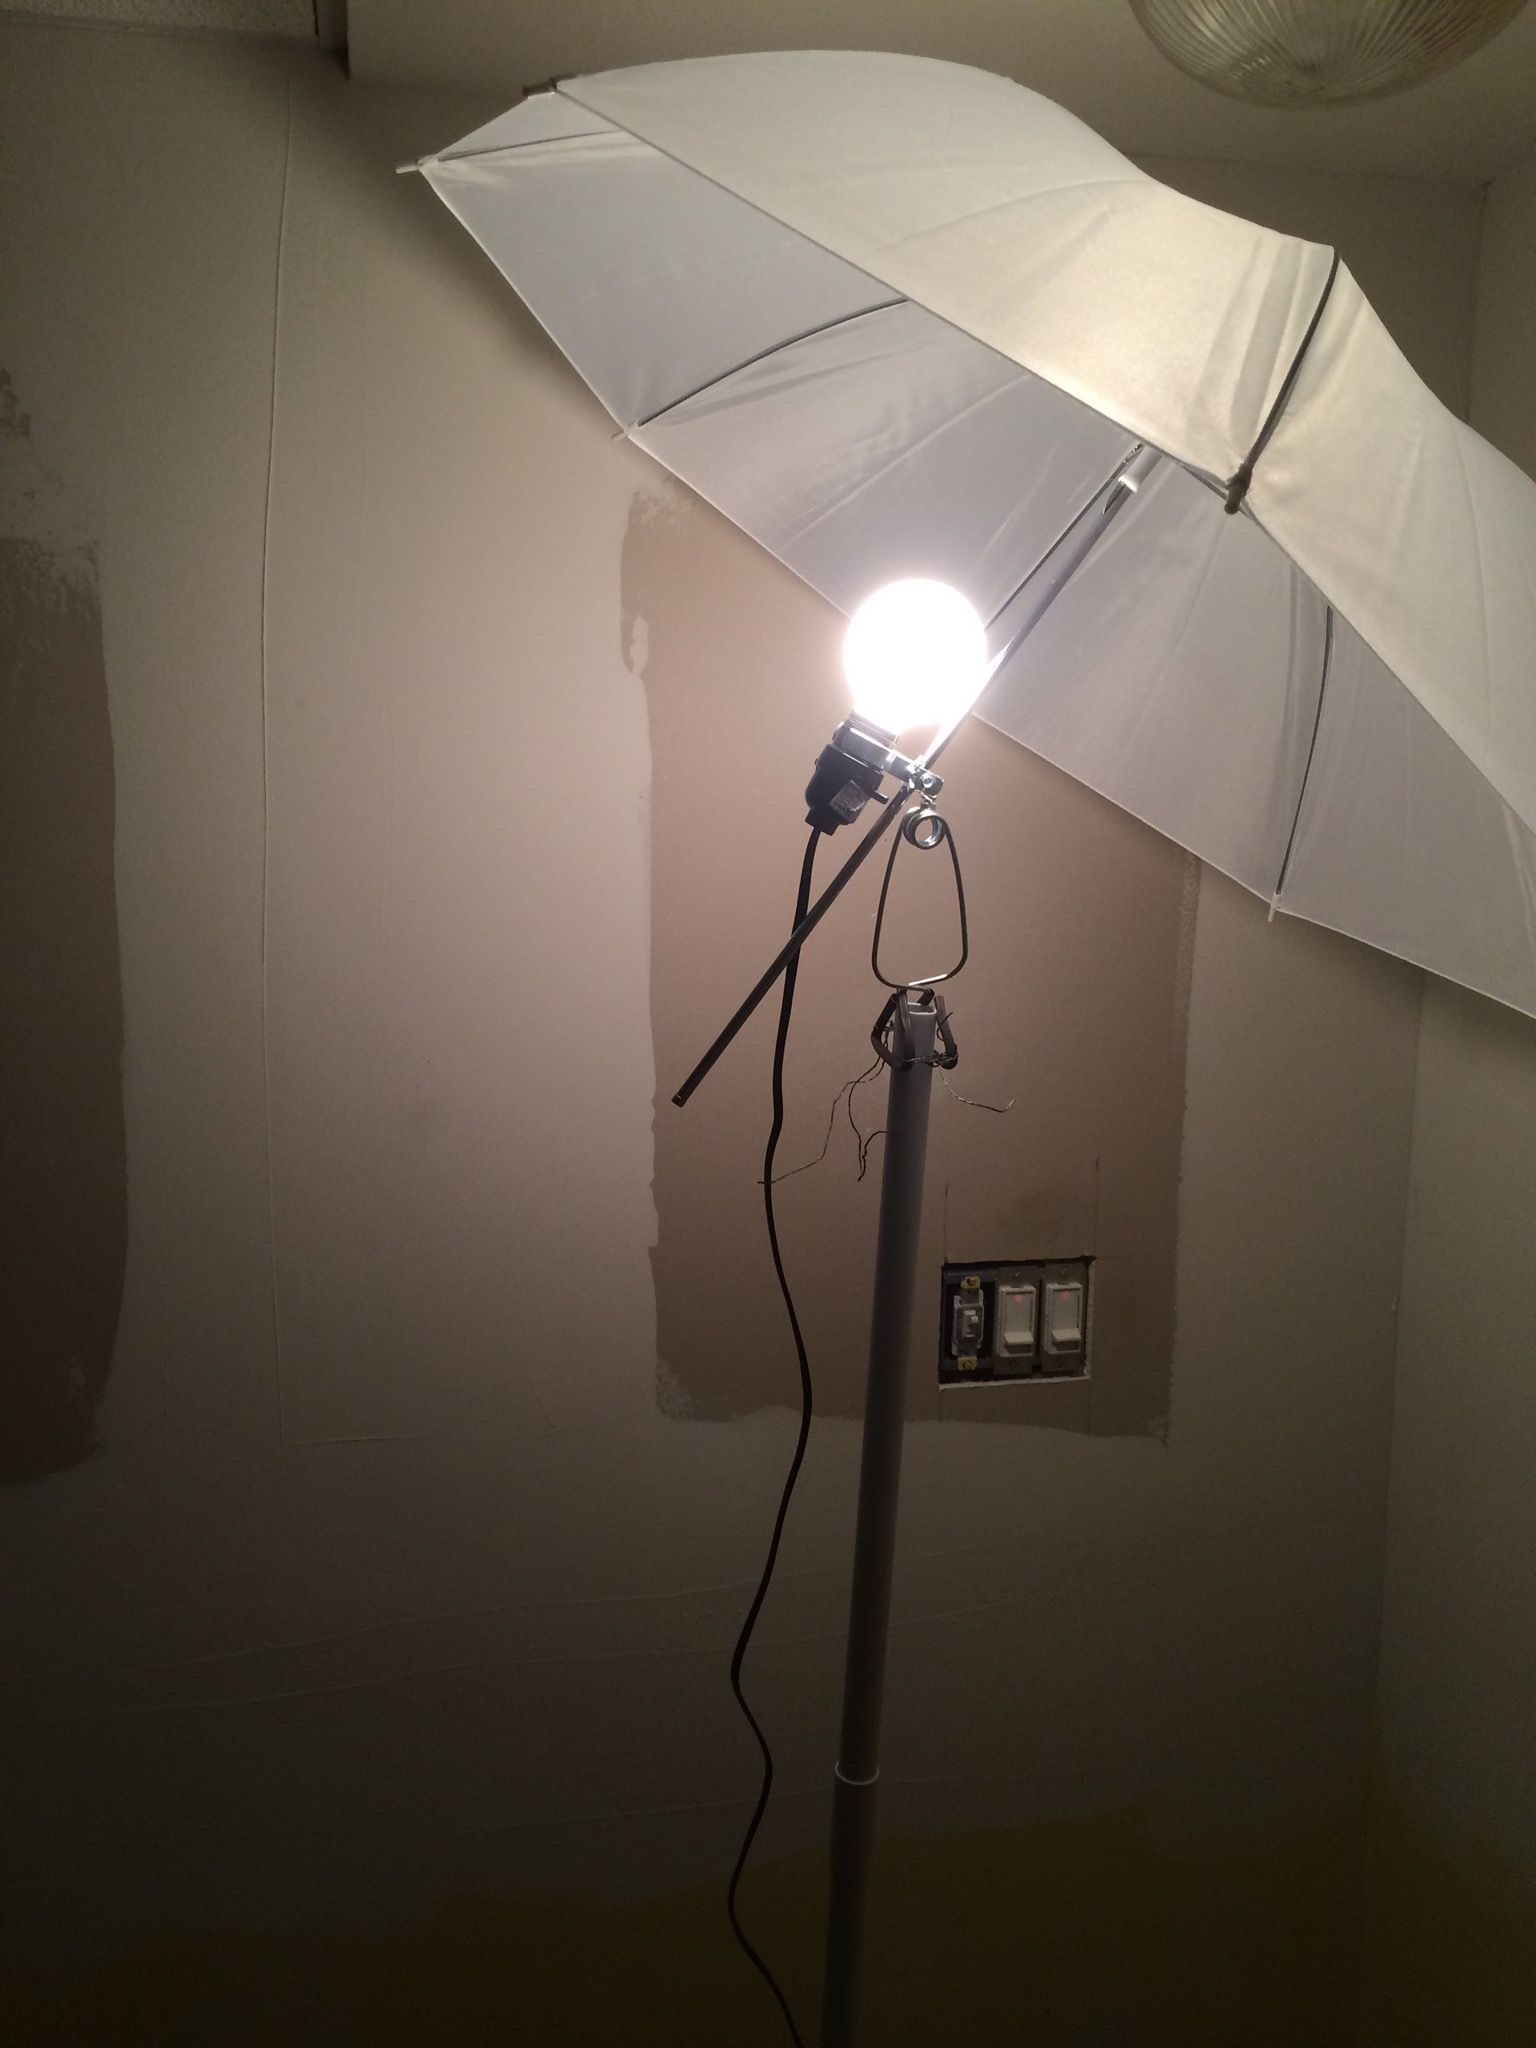 lamp interiores lights lighting repurposing de decoracion pin umbrella pinterest